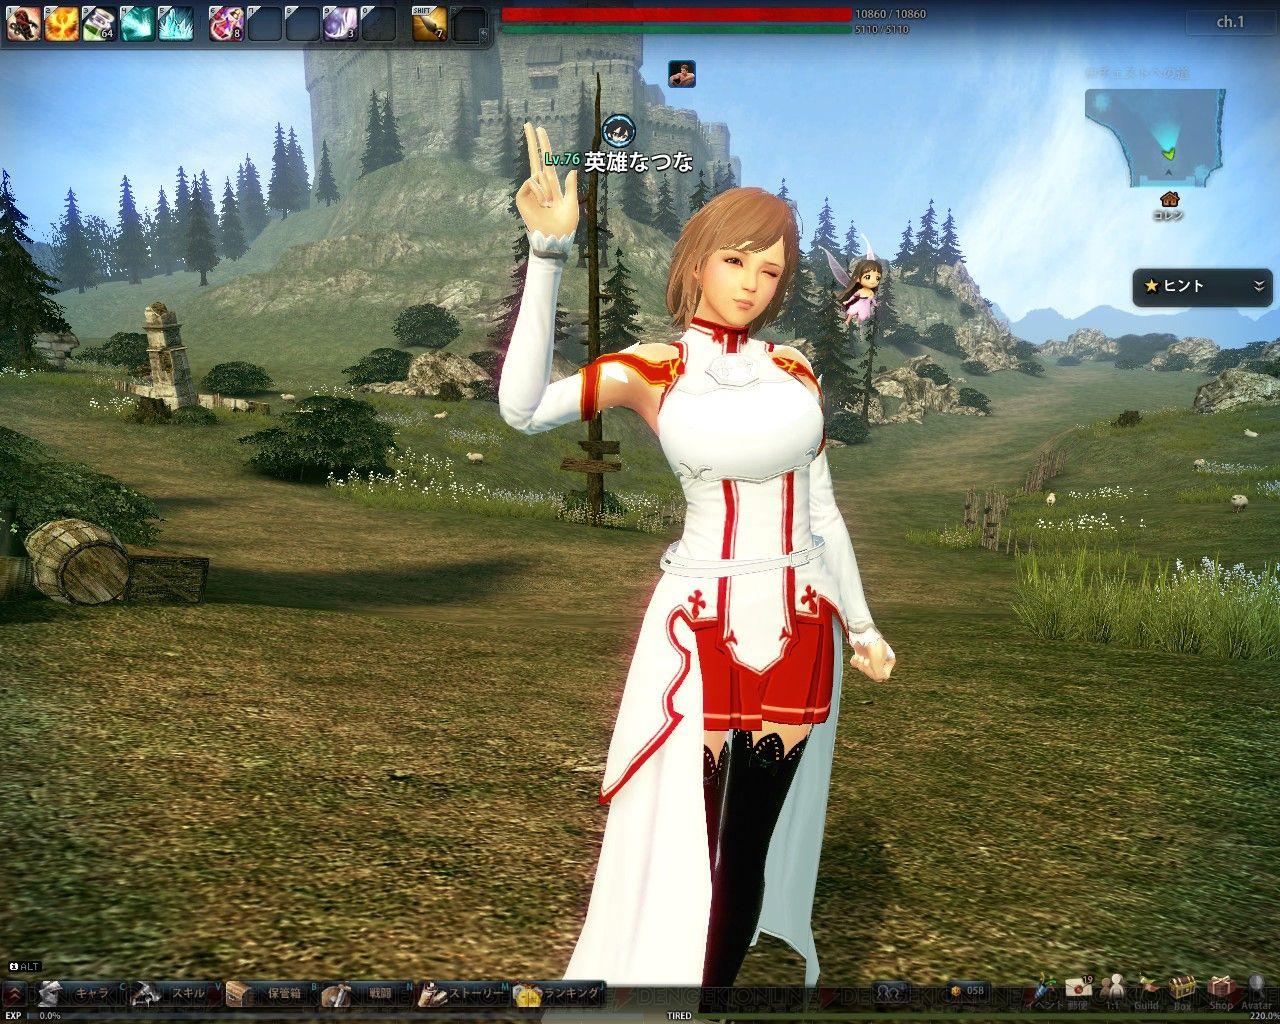 Sword Art Online X Mabinogi Heroes/Vindictus Asuna & gang